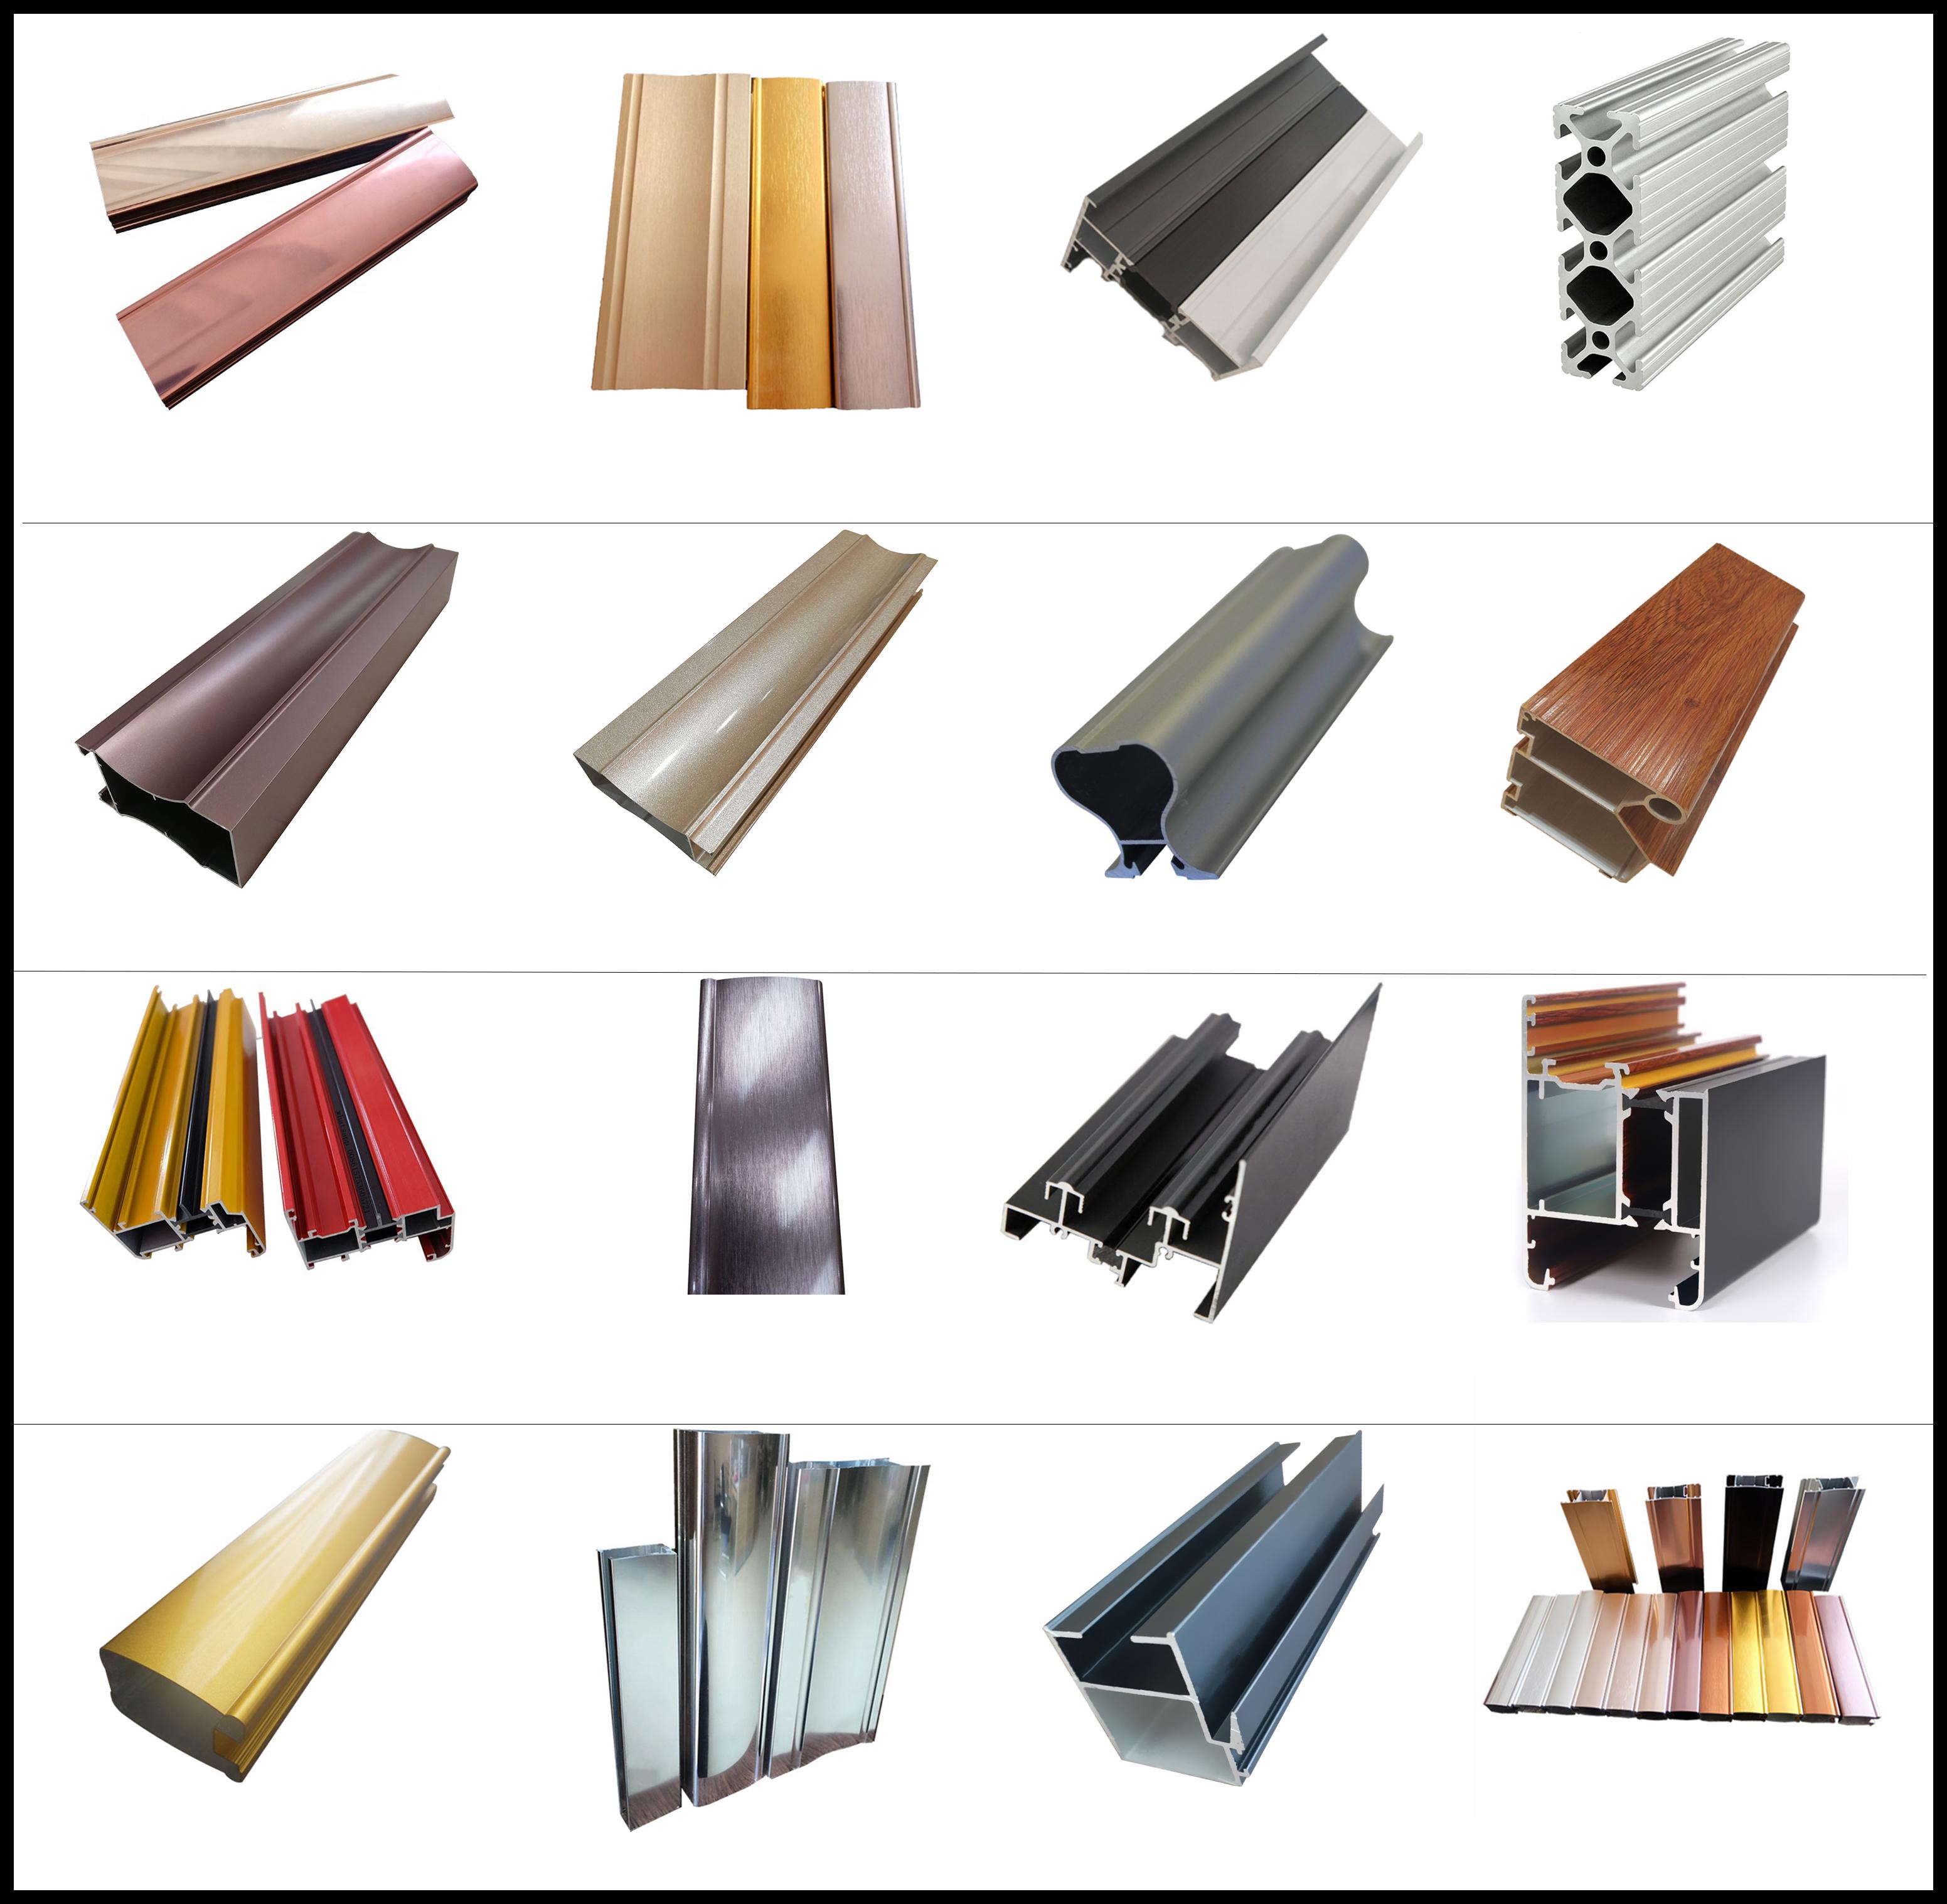 Moldura de alumínio porta do armário/perfiles de aluminio/jianmei de aluminio